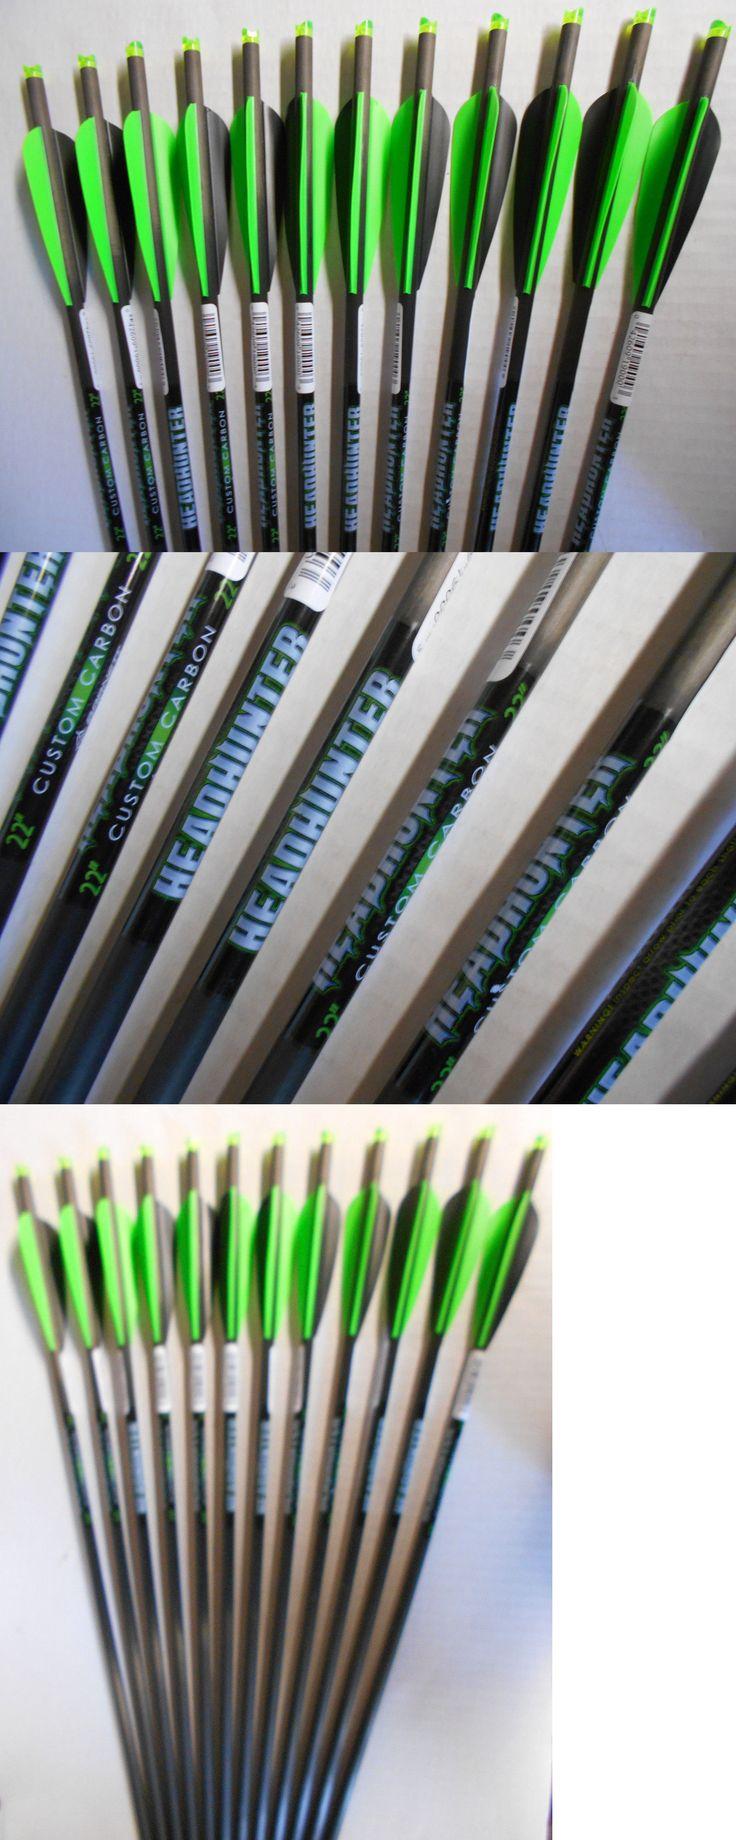 Crossbow Bolts 181309: @New@ 12- 22 Barnett Headhunter Carbon Crossbow Bolts! Head Hunter Arrows -> BUY IT NOW ONLY: $74.99 on eBay!